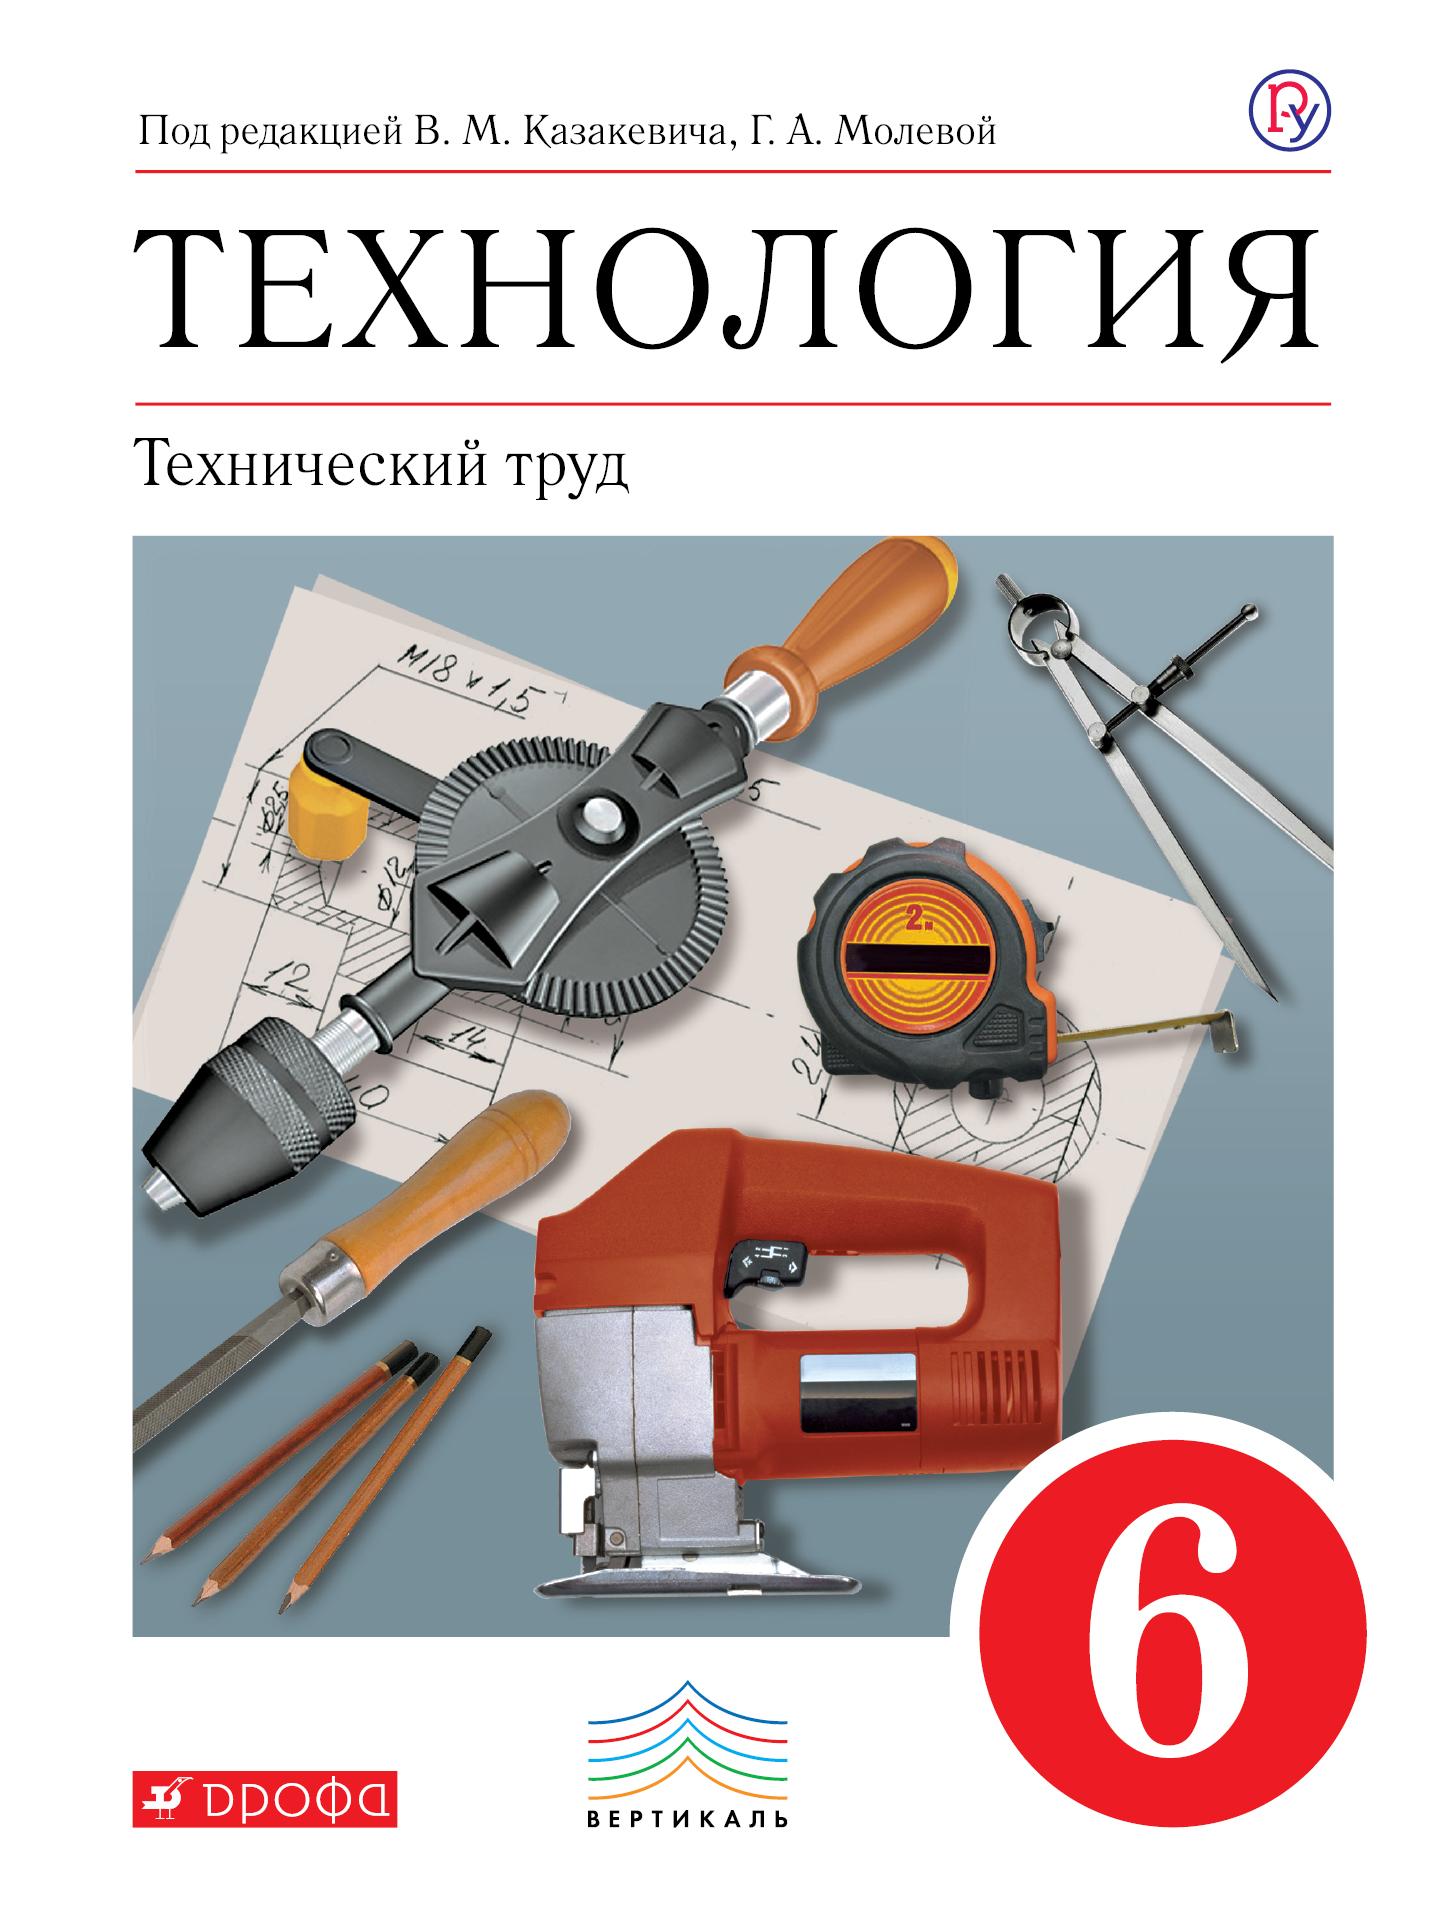 Технология. Технический труд. 6 класс. Учебник